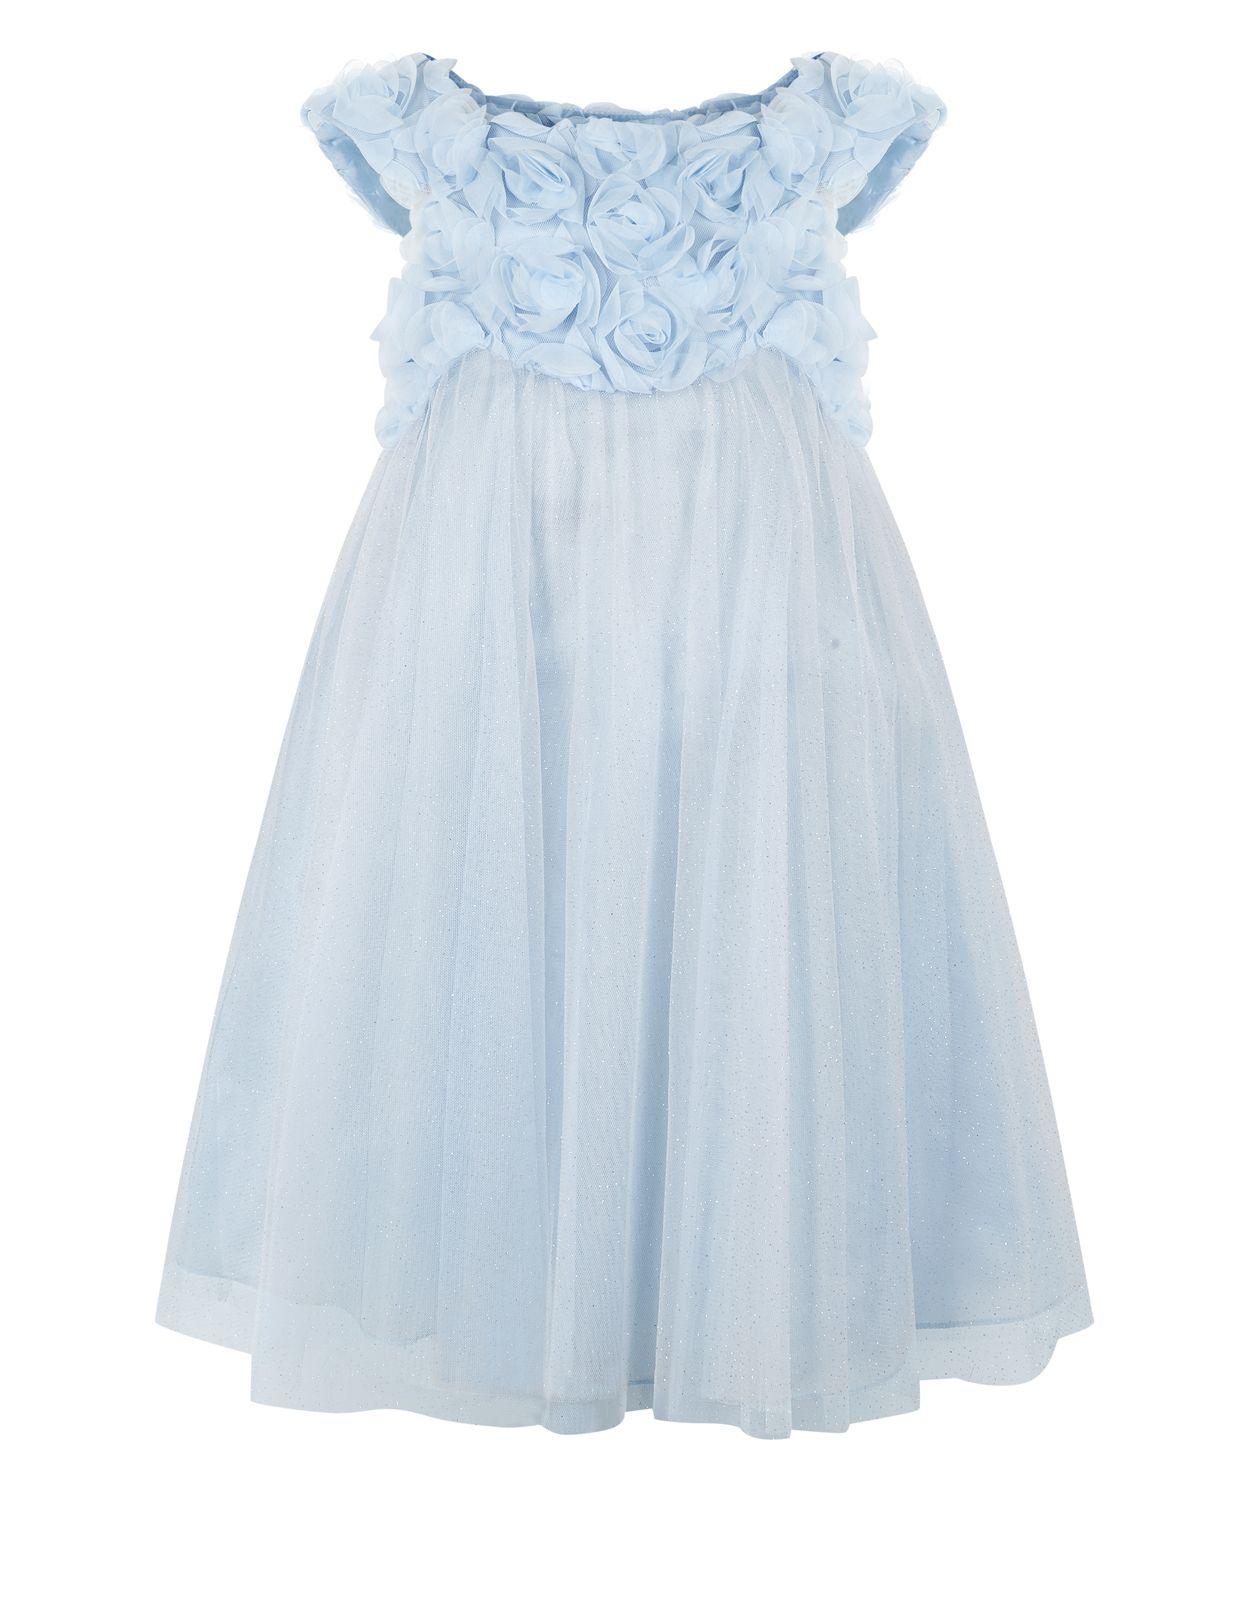 Park Art My WordPress Blog_Dusty Blue Flower Girl Dress Uk